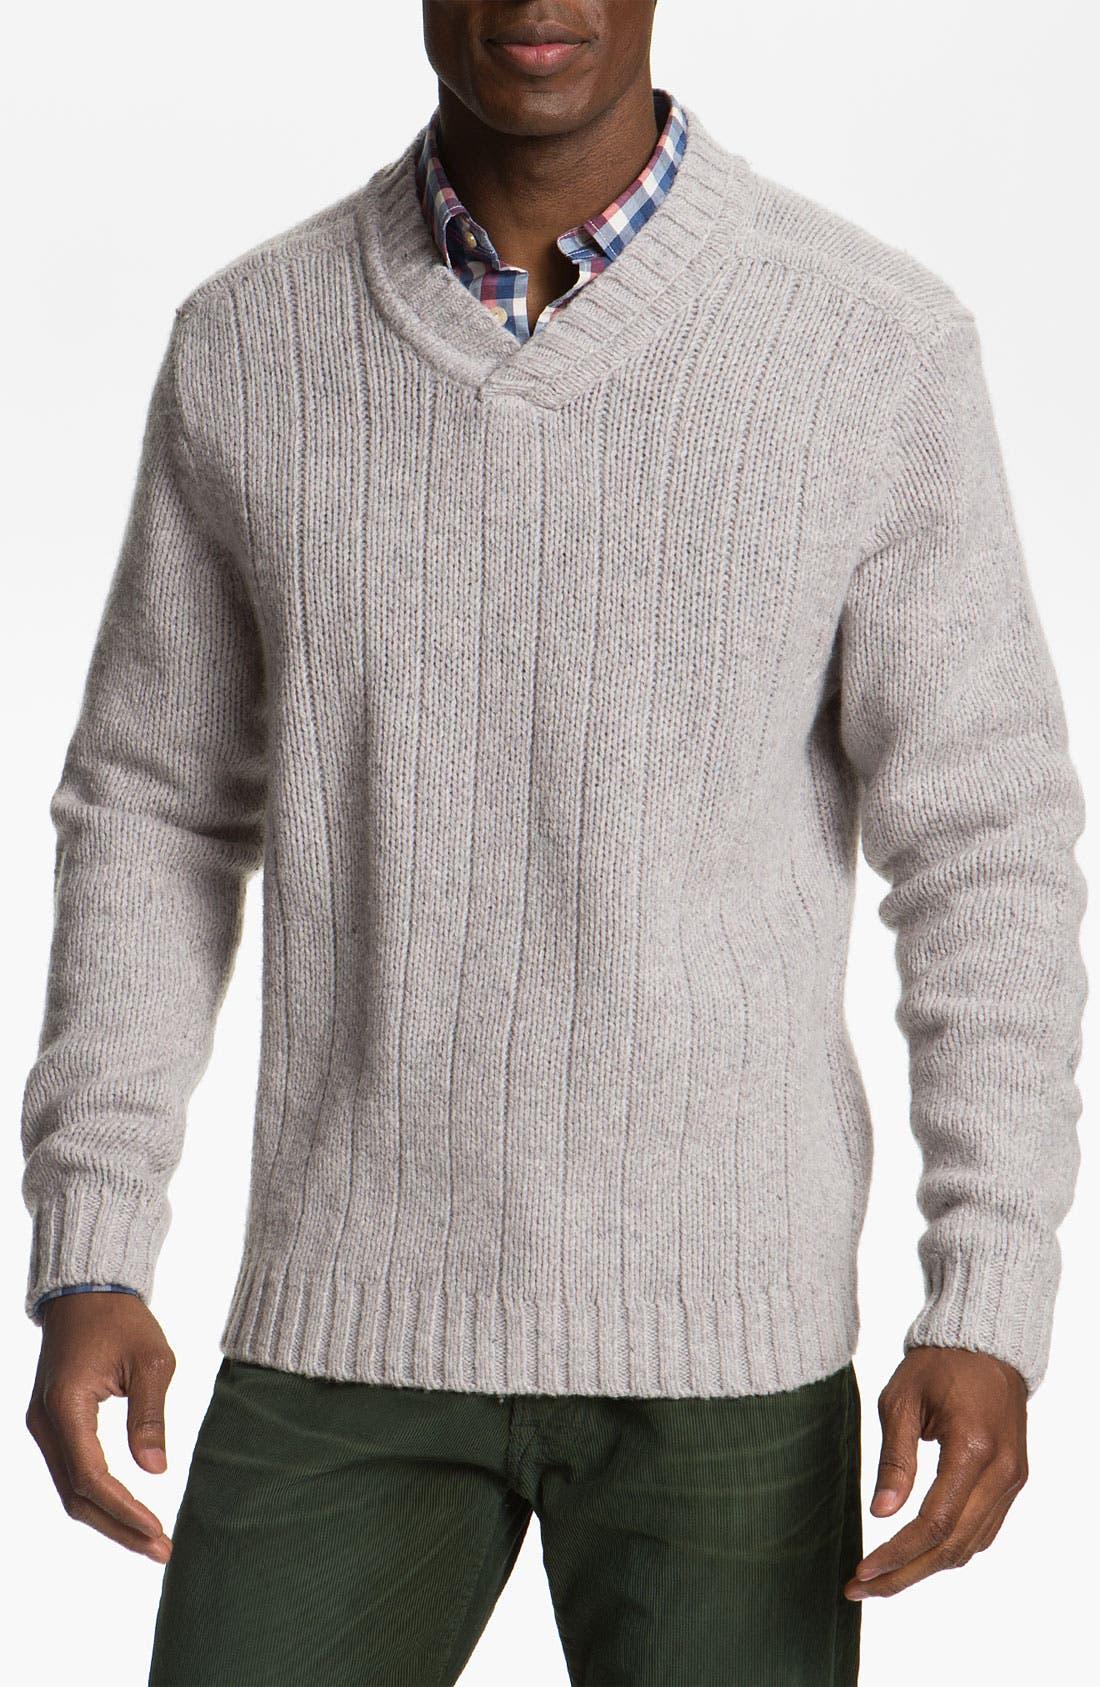 Main Image - Cutter & Buck 'Northlands' V-Neck Wool Blend Sweater